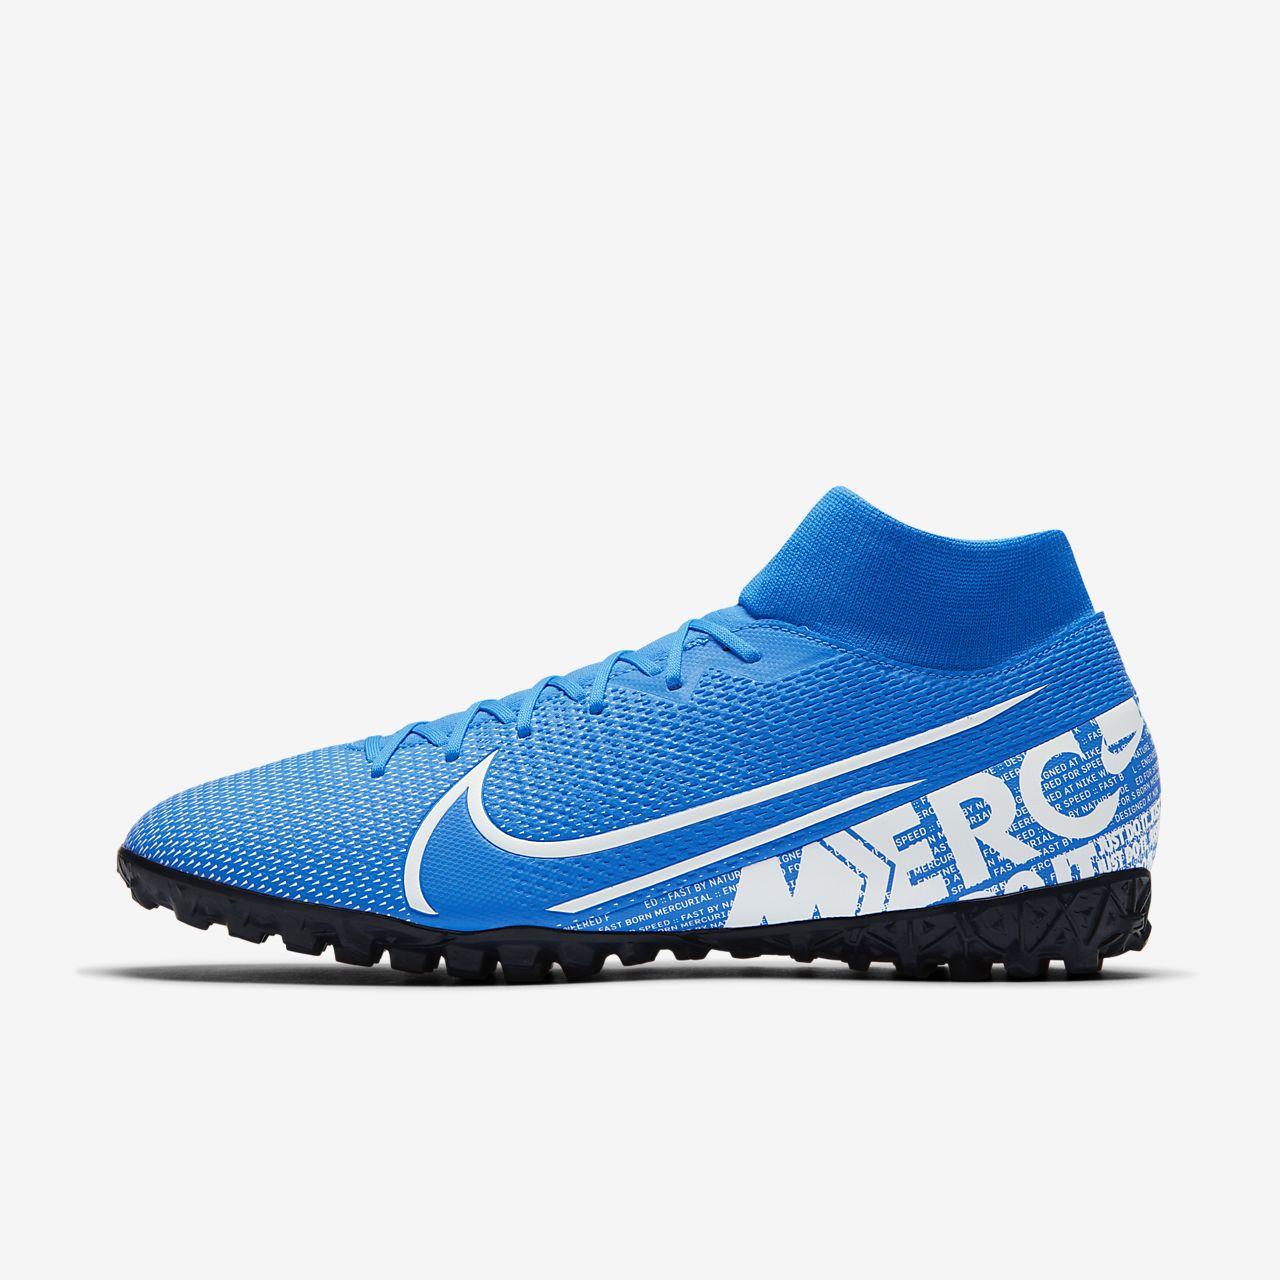 sortie d'usine prix favorable belles chaussures Chaussure de football pour surface synthétique Nike Mercurial Superfly 7  Academy TF